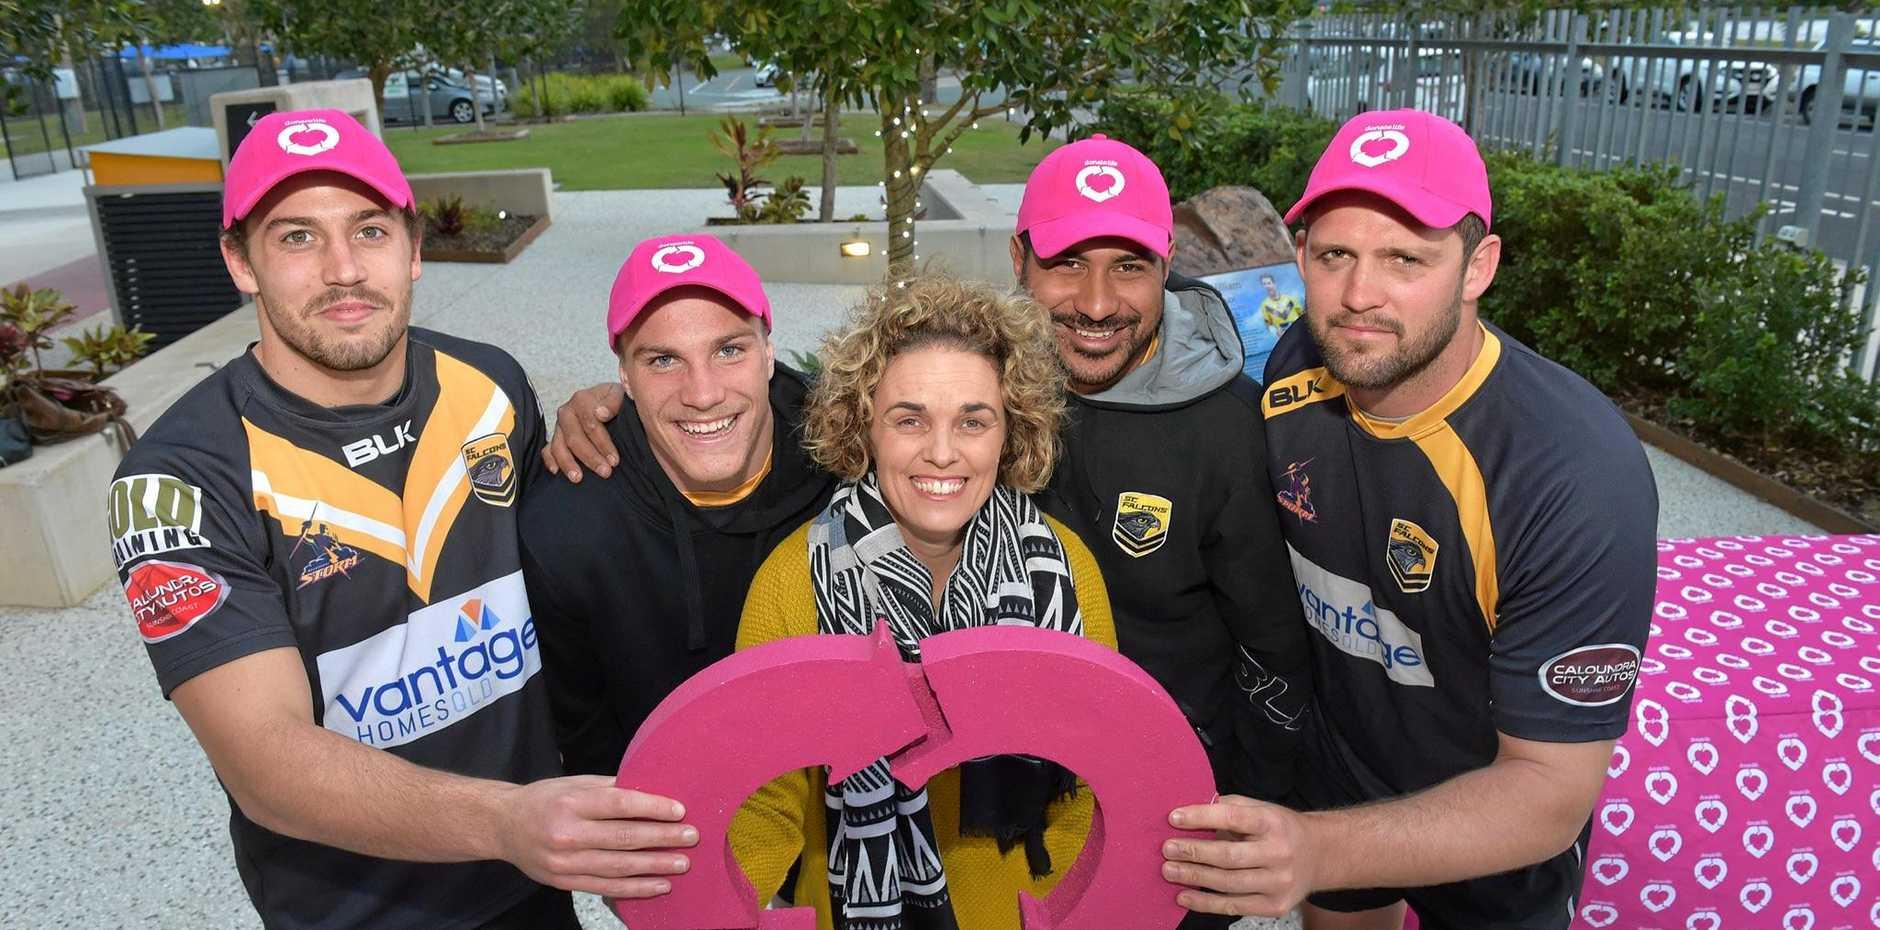 DONATE LIFE: Tom Geraghty, Alex Coplin, Jake Samoa and Ryan Hansen with Sonya Ackerman, mother of the late Sunshine Coast footballer James Ackerman, support Donate Life Week.